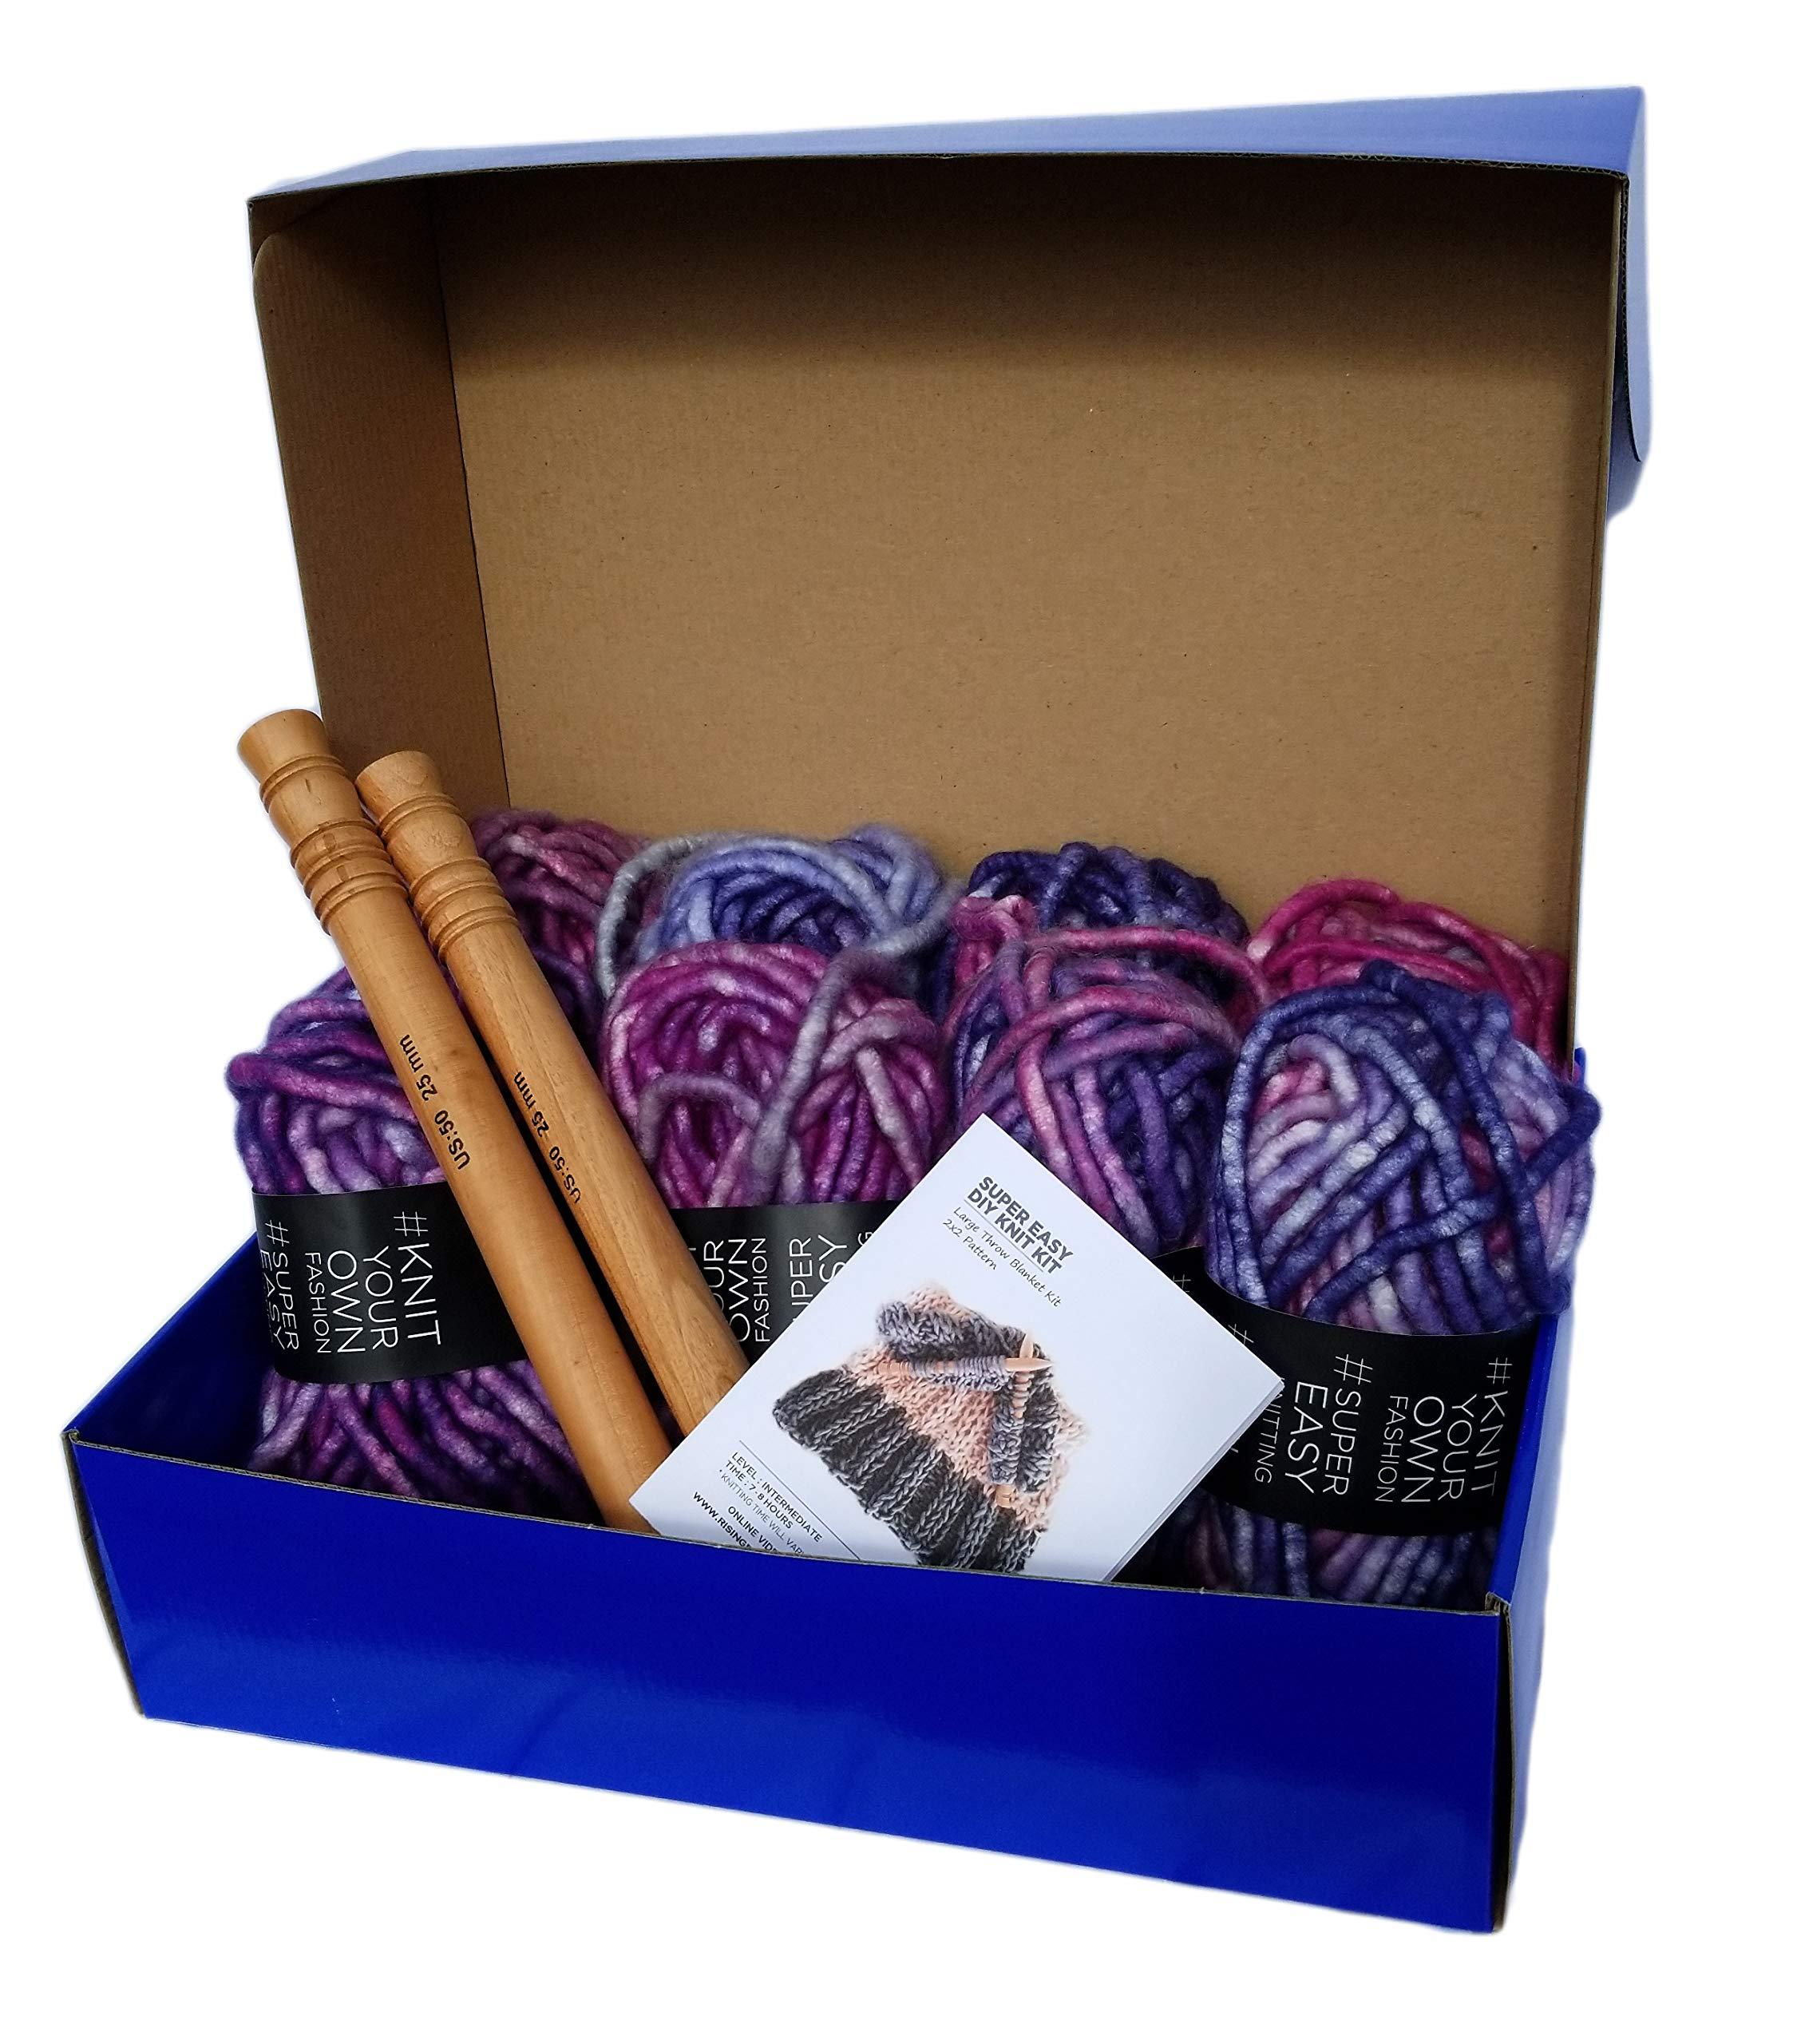 Large Chunky Throw Blanket DIY Knit Kit, Super Soft Thick Yarn w/Large Wood Knitting Needles US 50 Set (Pink & Purple Marled) by Rising Phoenix Industries (Image #1)